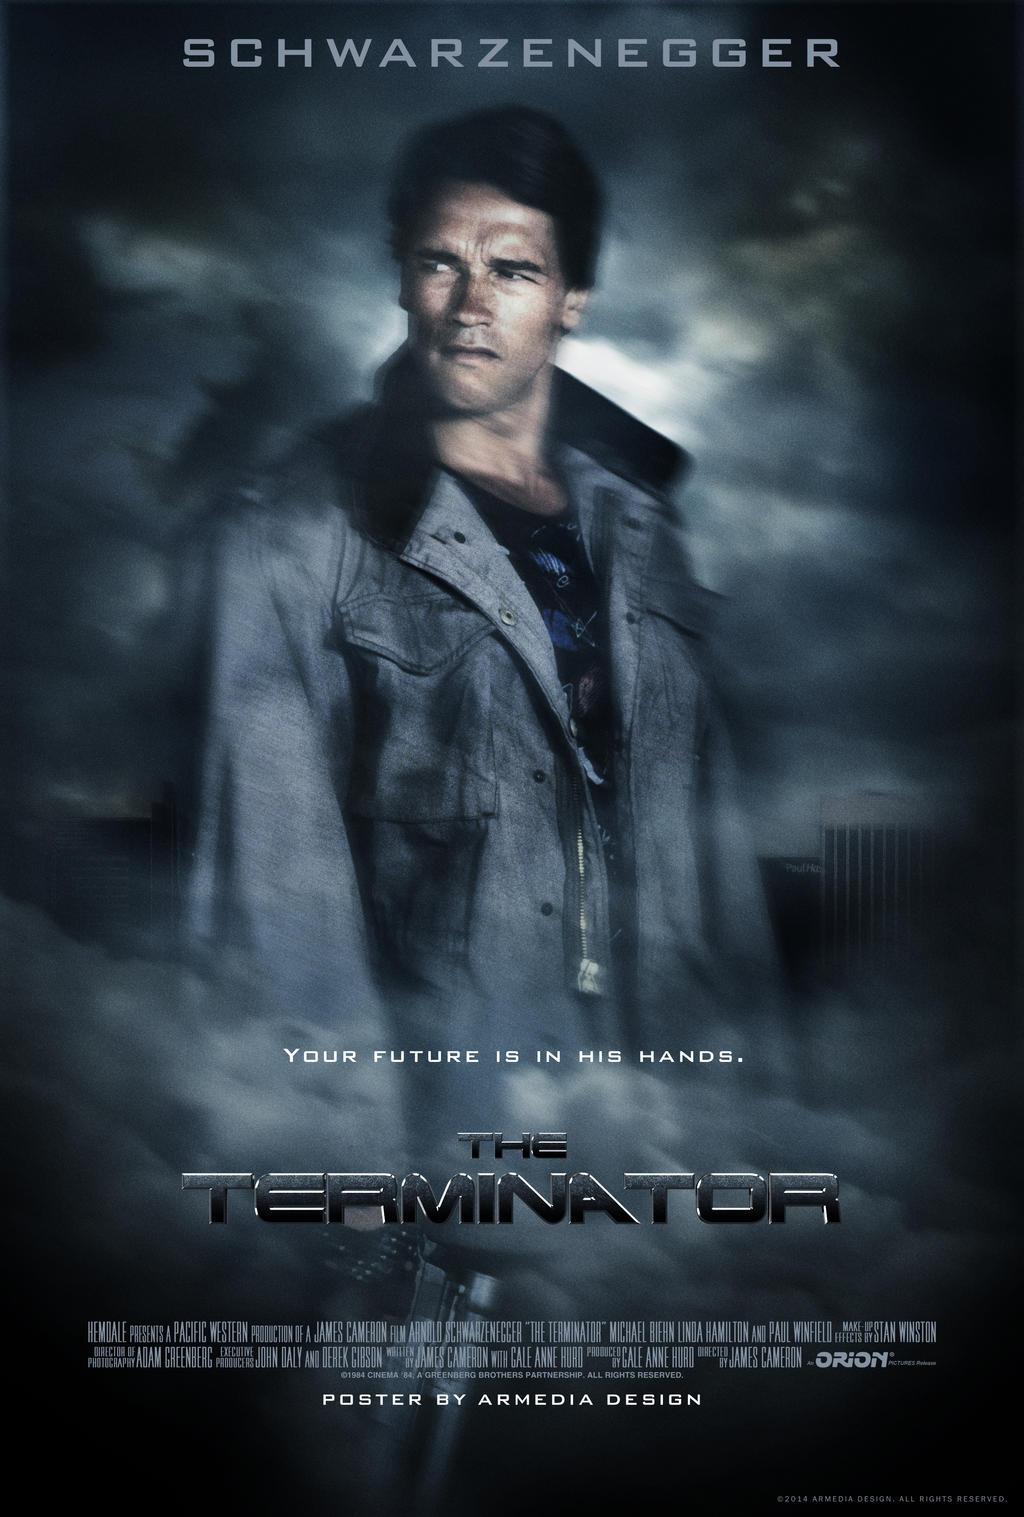 The Terminator Movie Poster 000 by altobello02 on DeviantArt